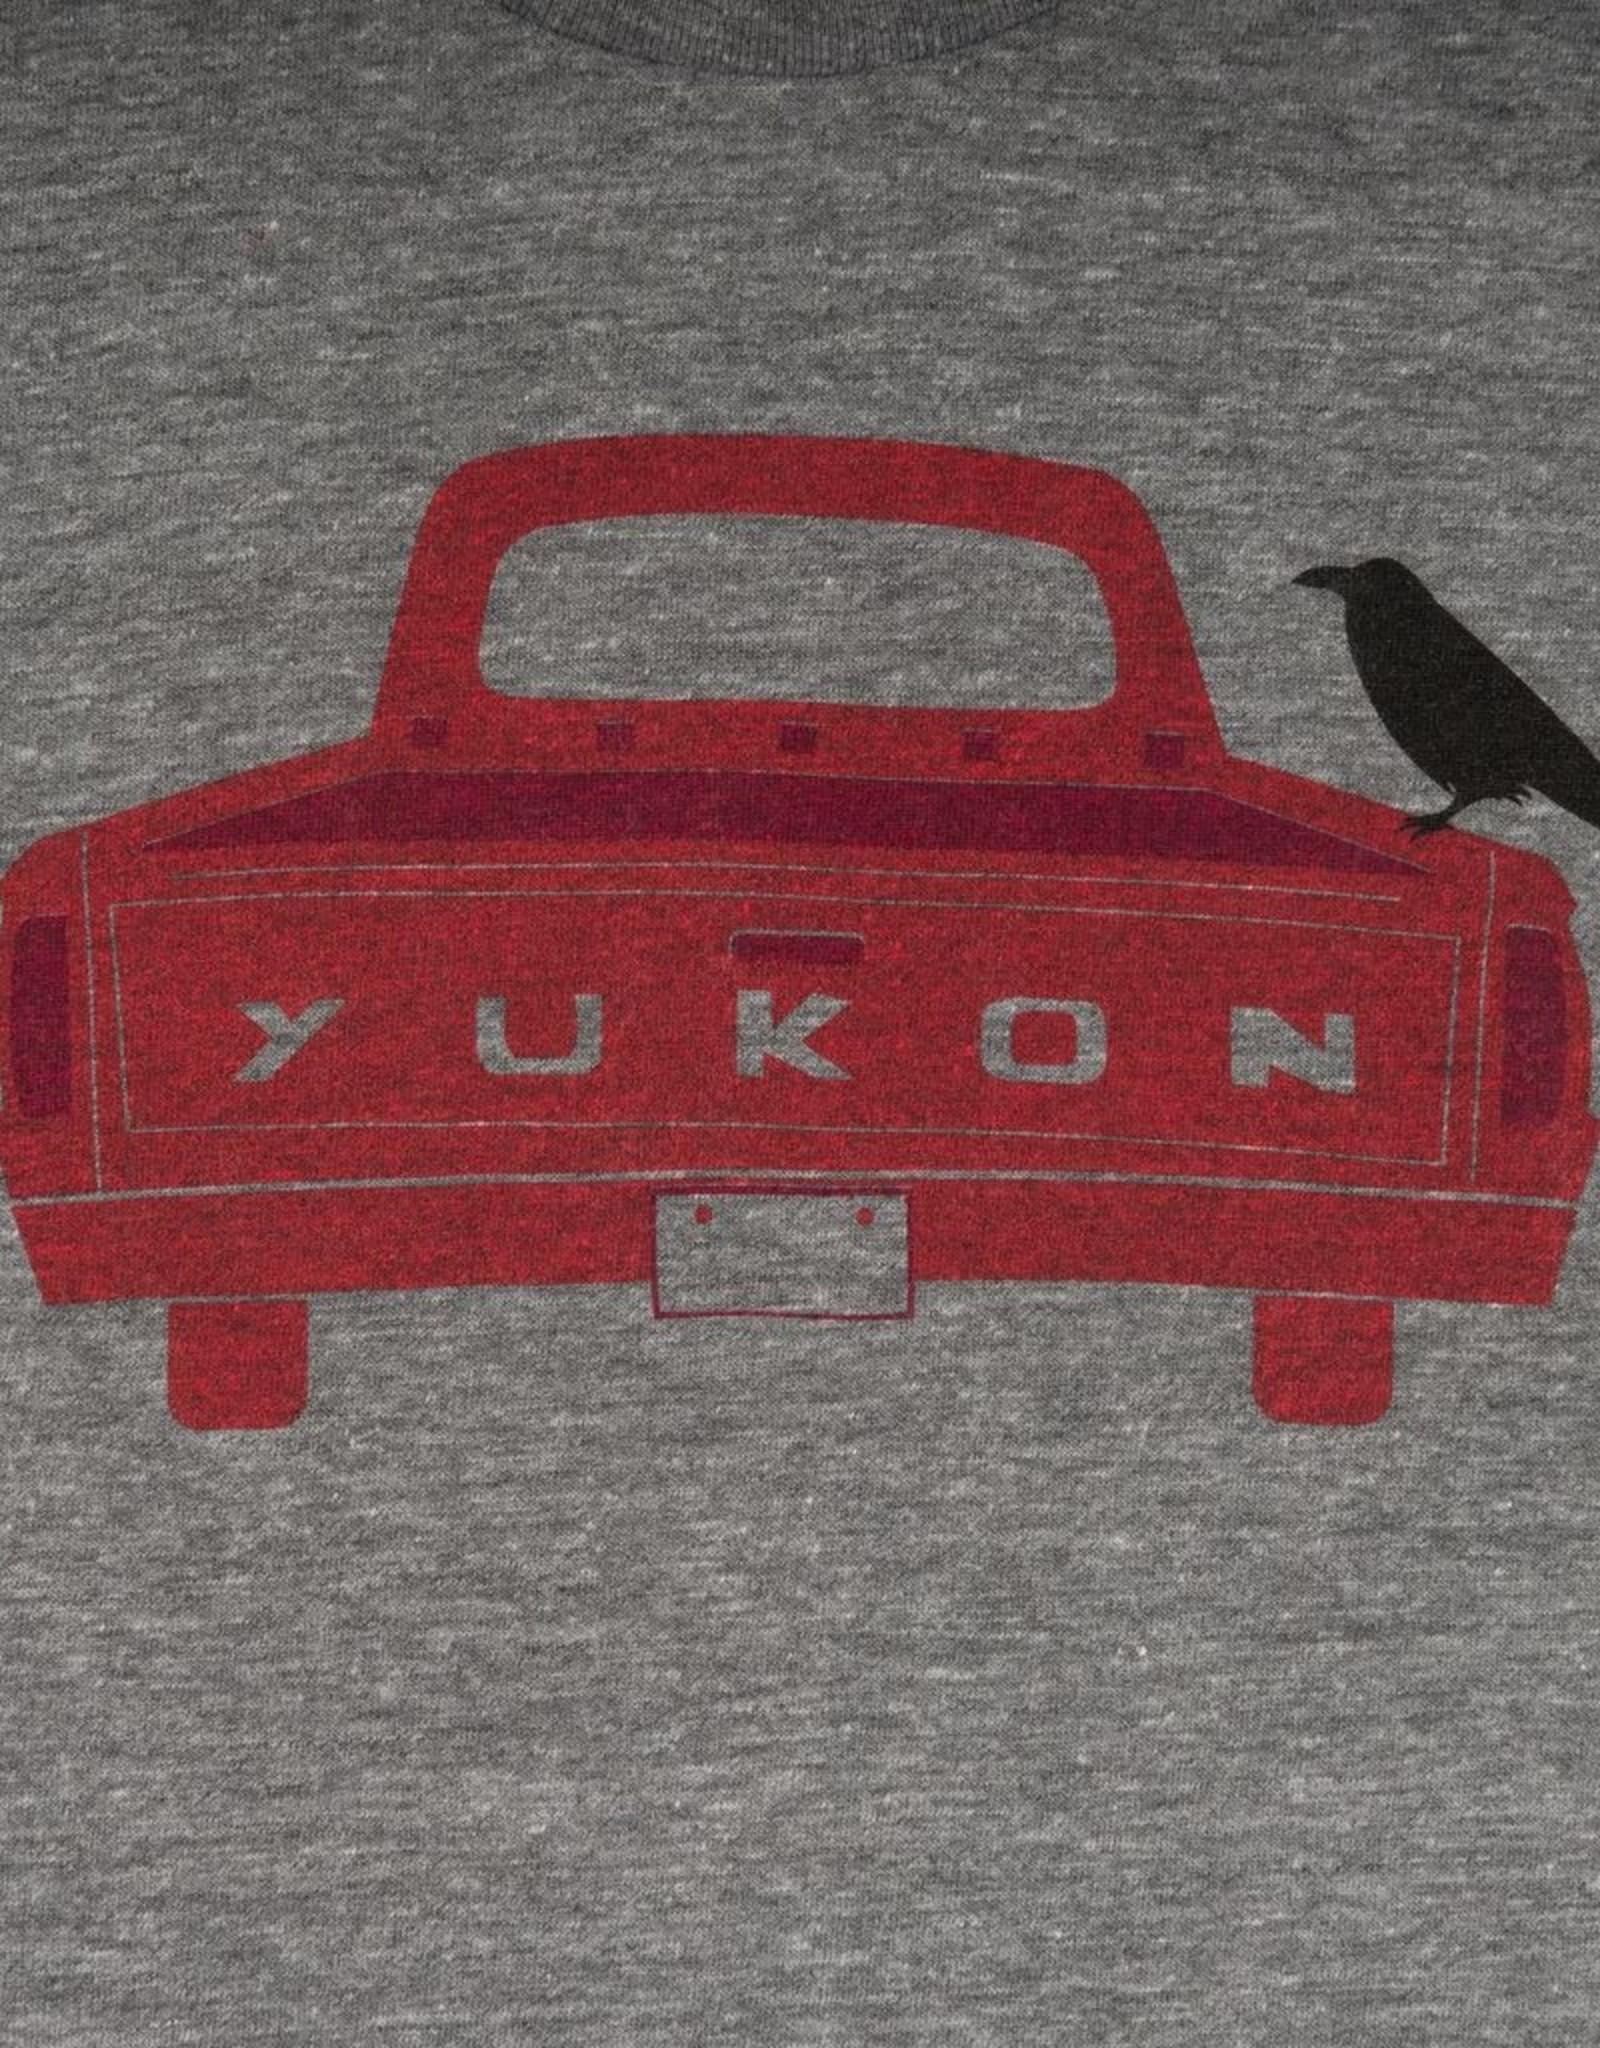 The Collective Good TCG Yukon Truck Onesie